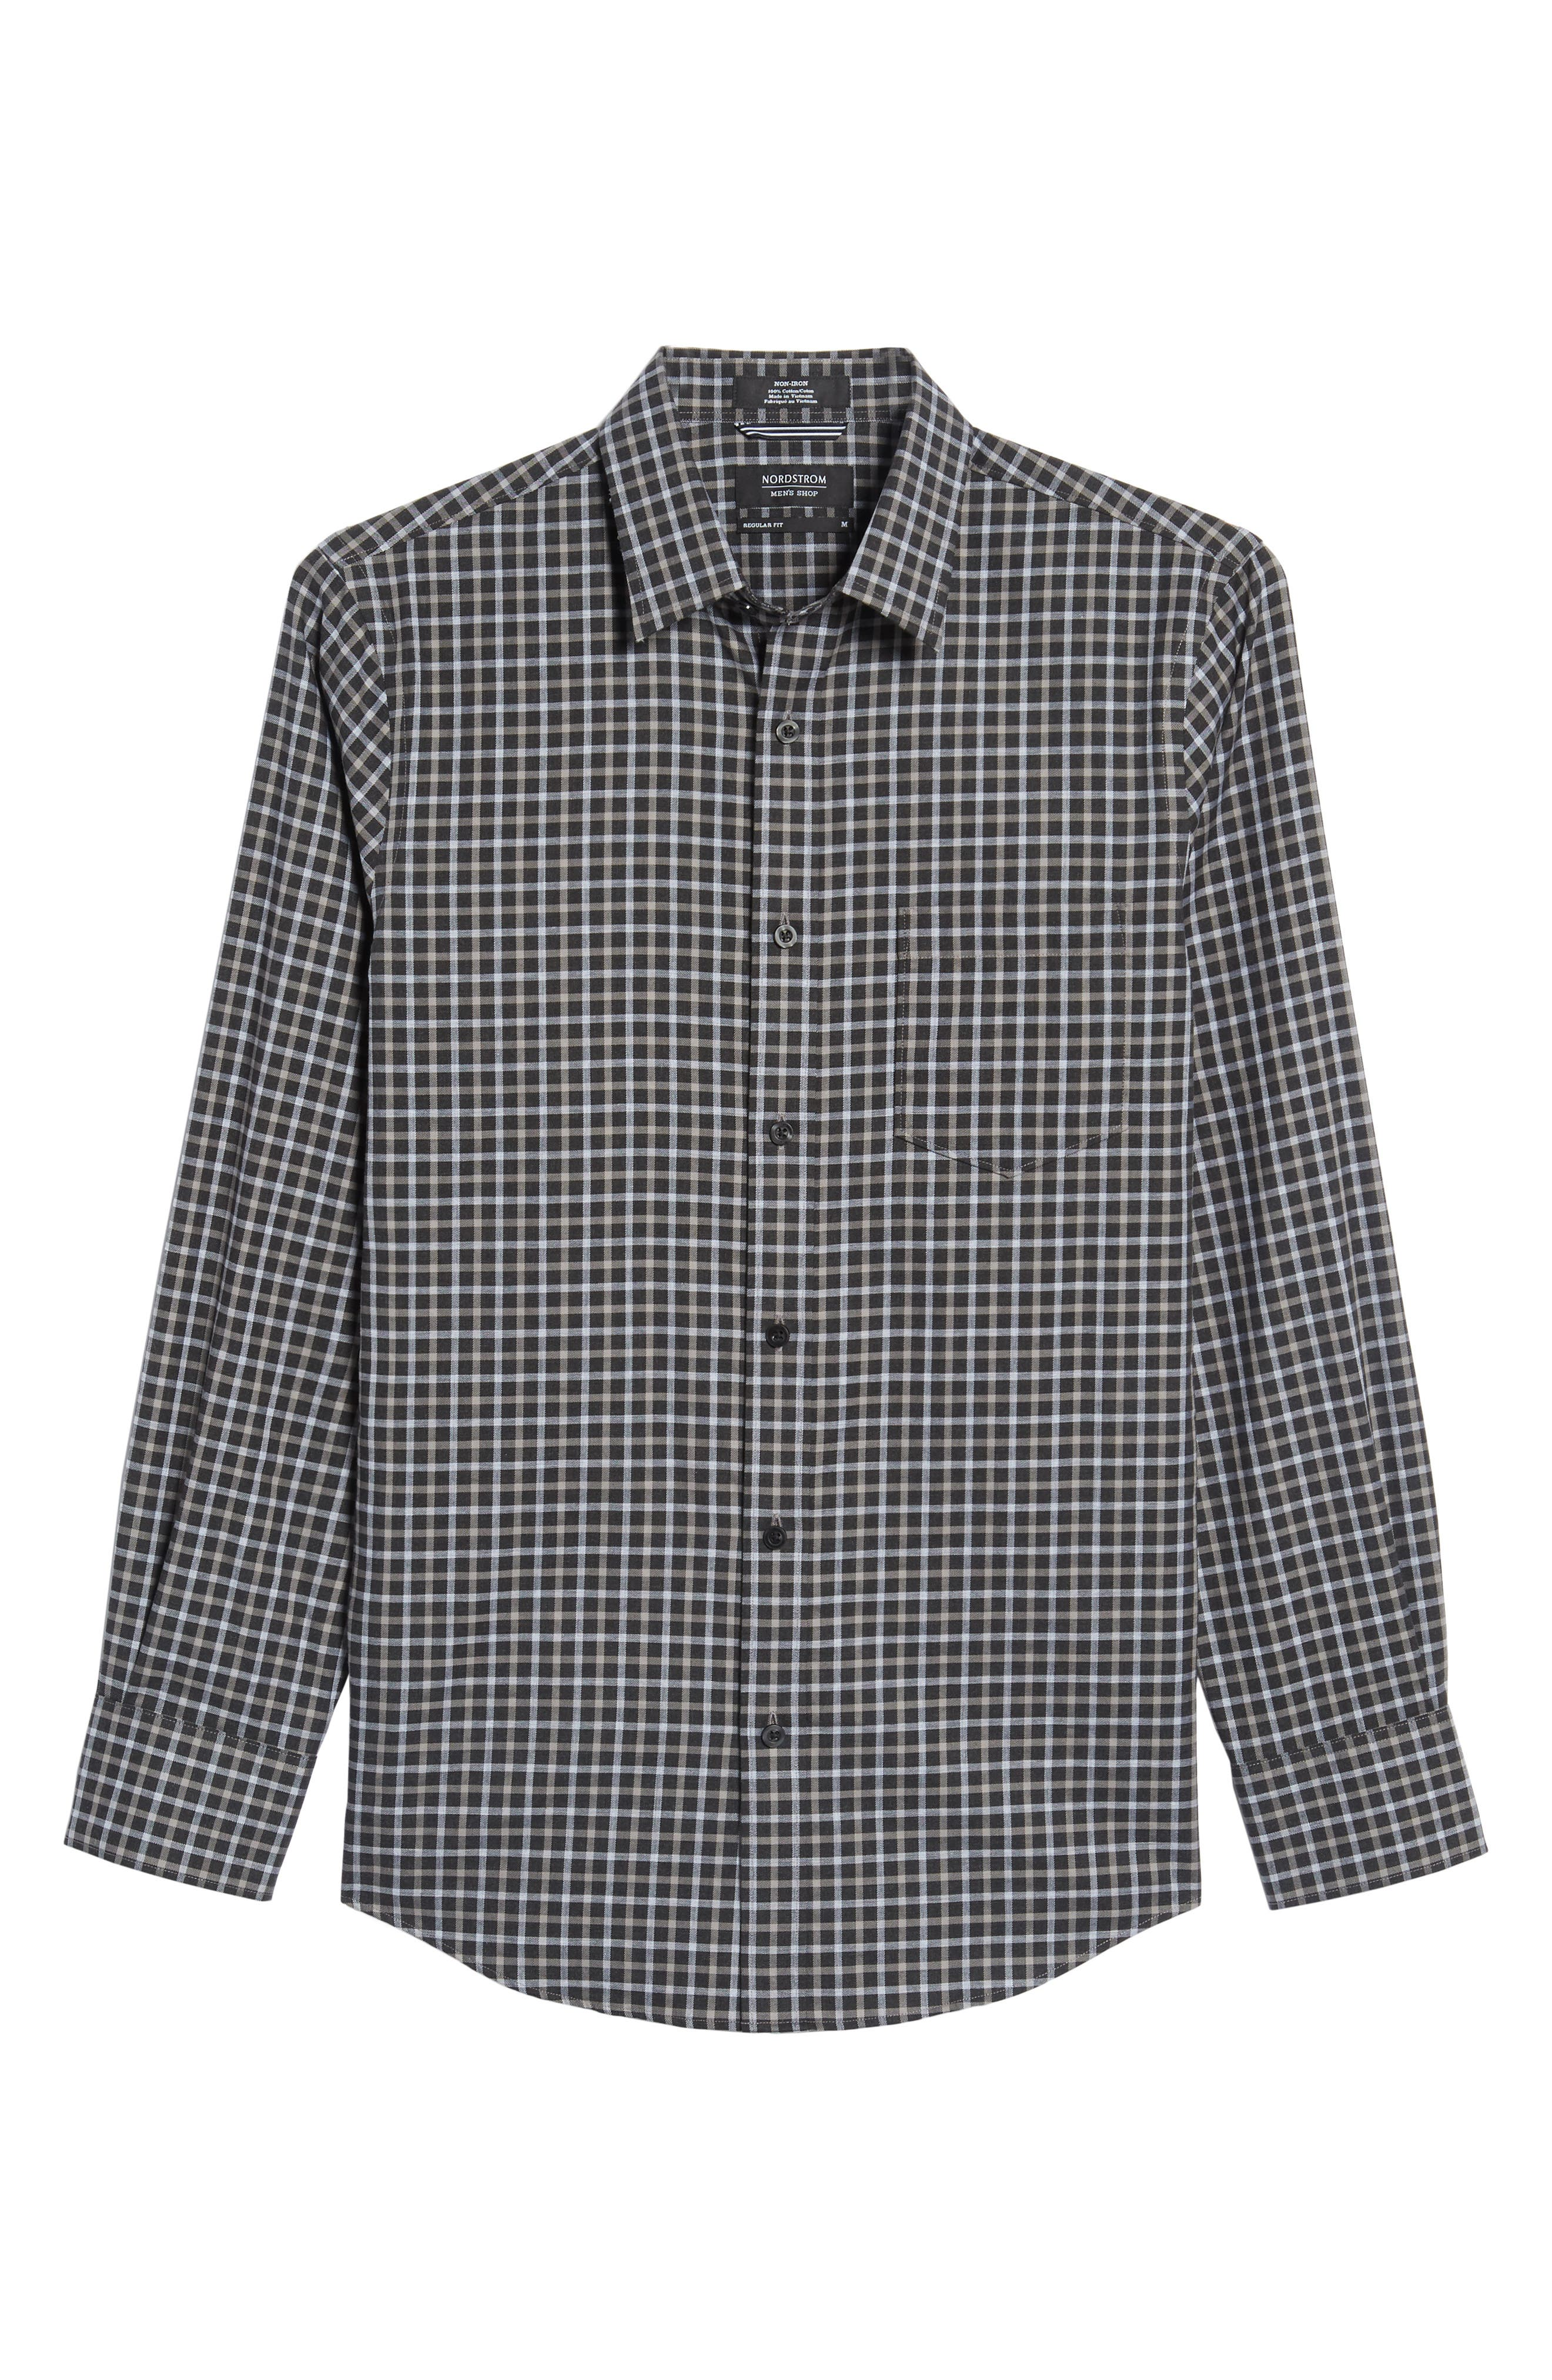 Regular Fit Non-Iron Check Sport Shirt,                             Alternate thumbnail 6, color,                             Black Caviar Grey Check